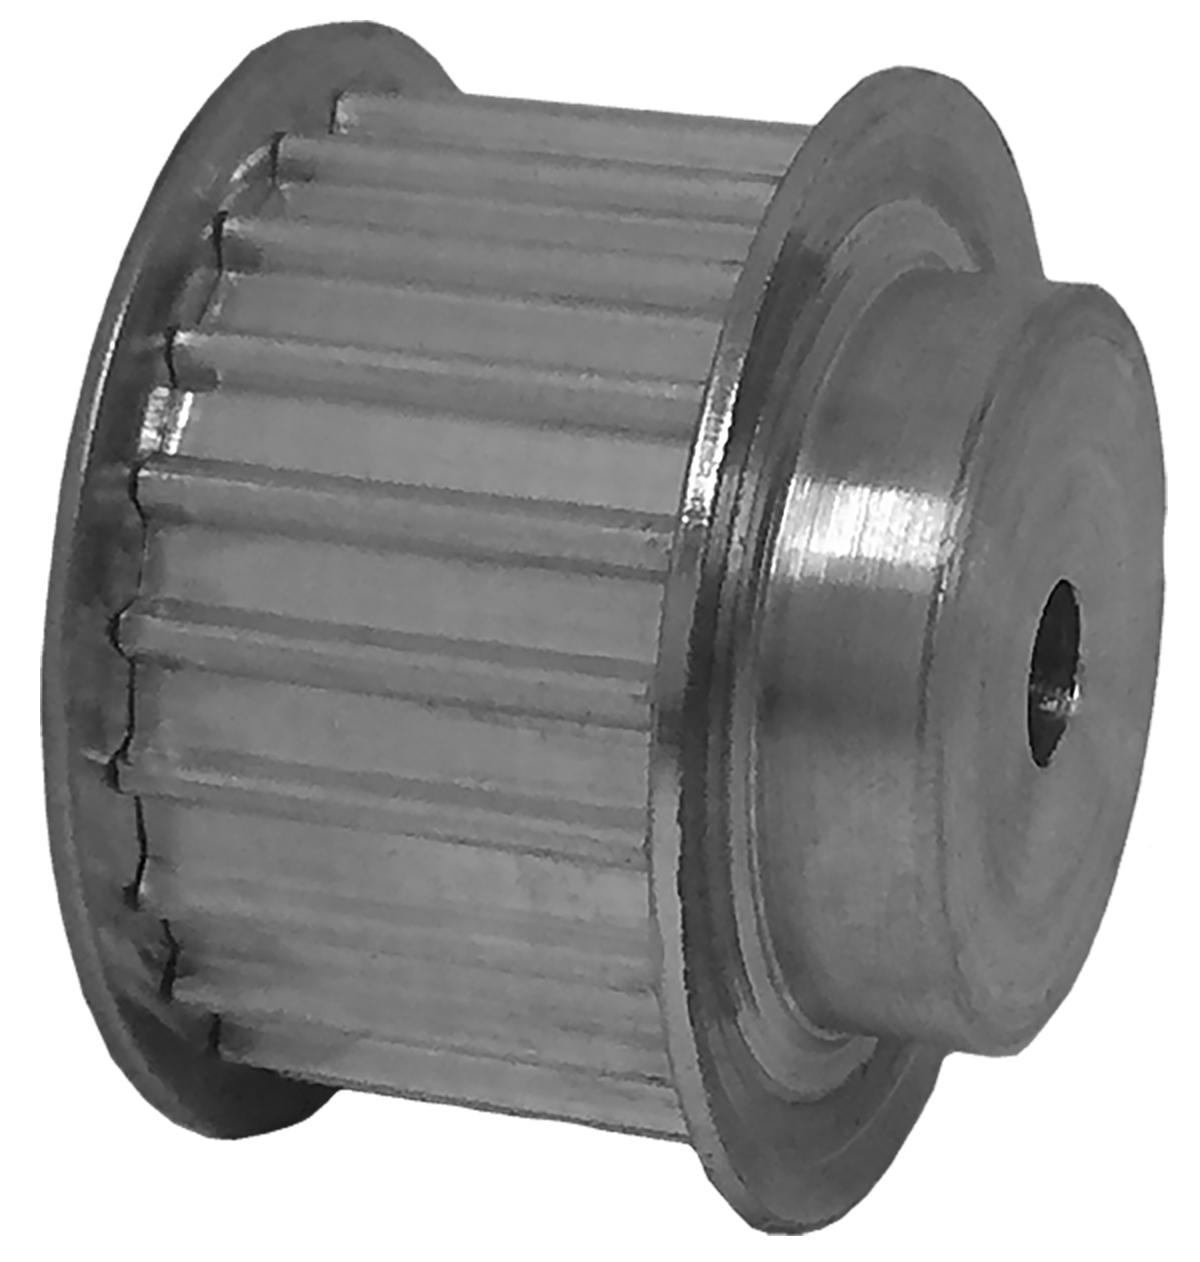 27AT5/22-2 - Aluminum Metric Pulleys